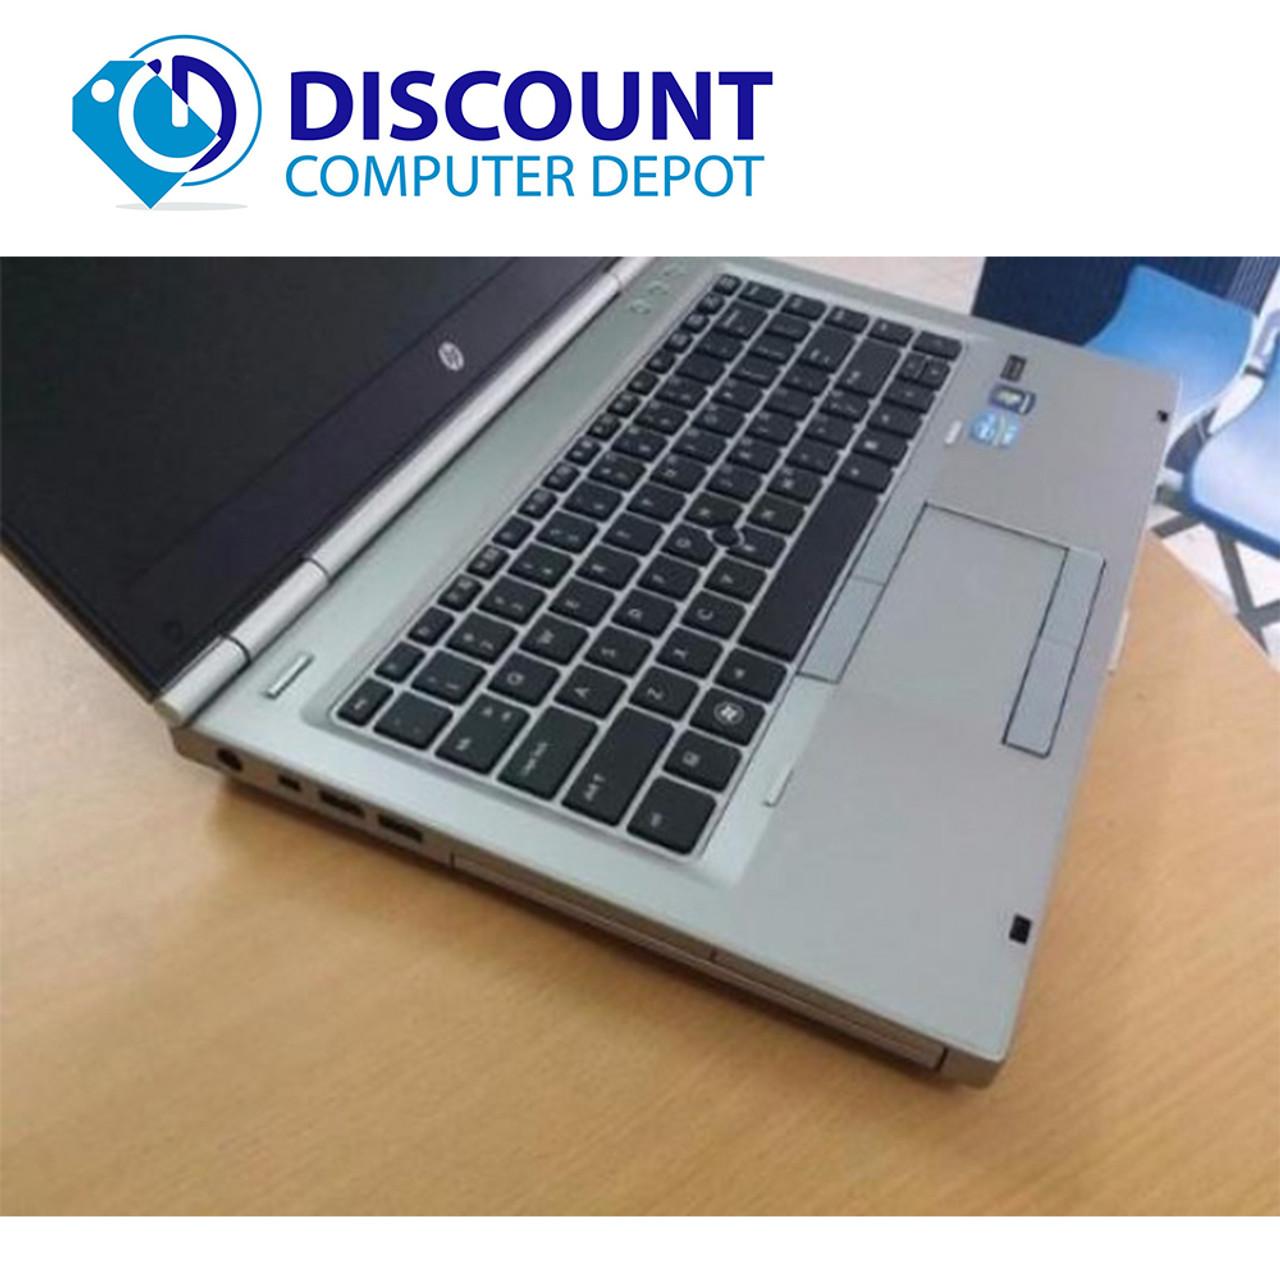 HP Elitebook 8470p Windows 10 Pro Laptop Notebook PC i5